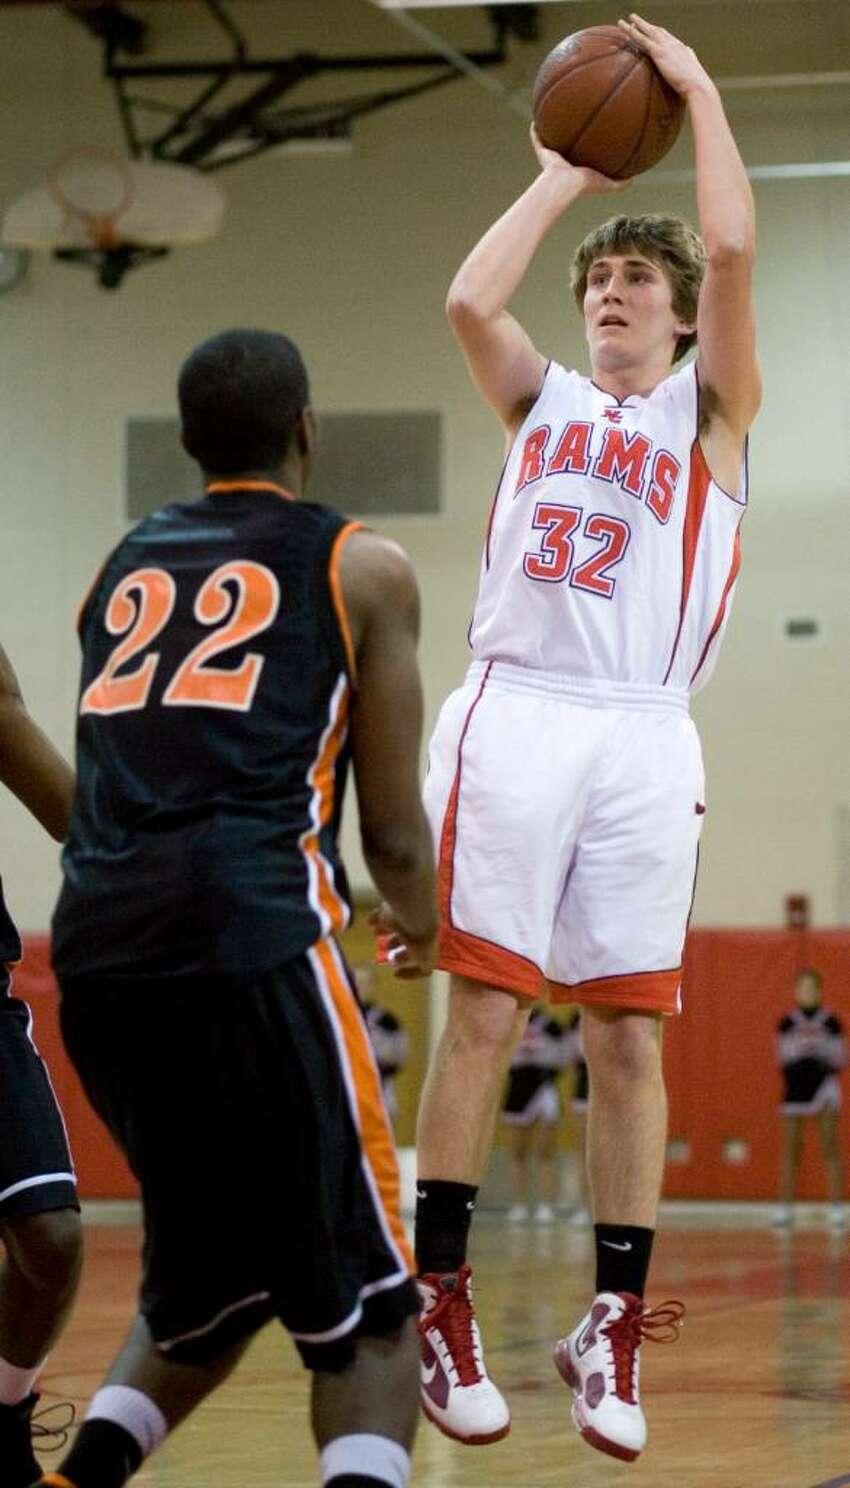 Stamford High School plays New Canaan High School in boys basketball in New Canaan.